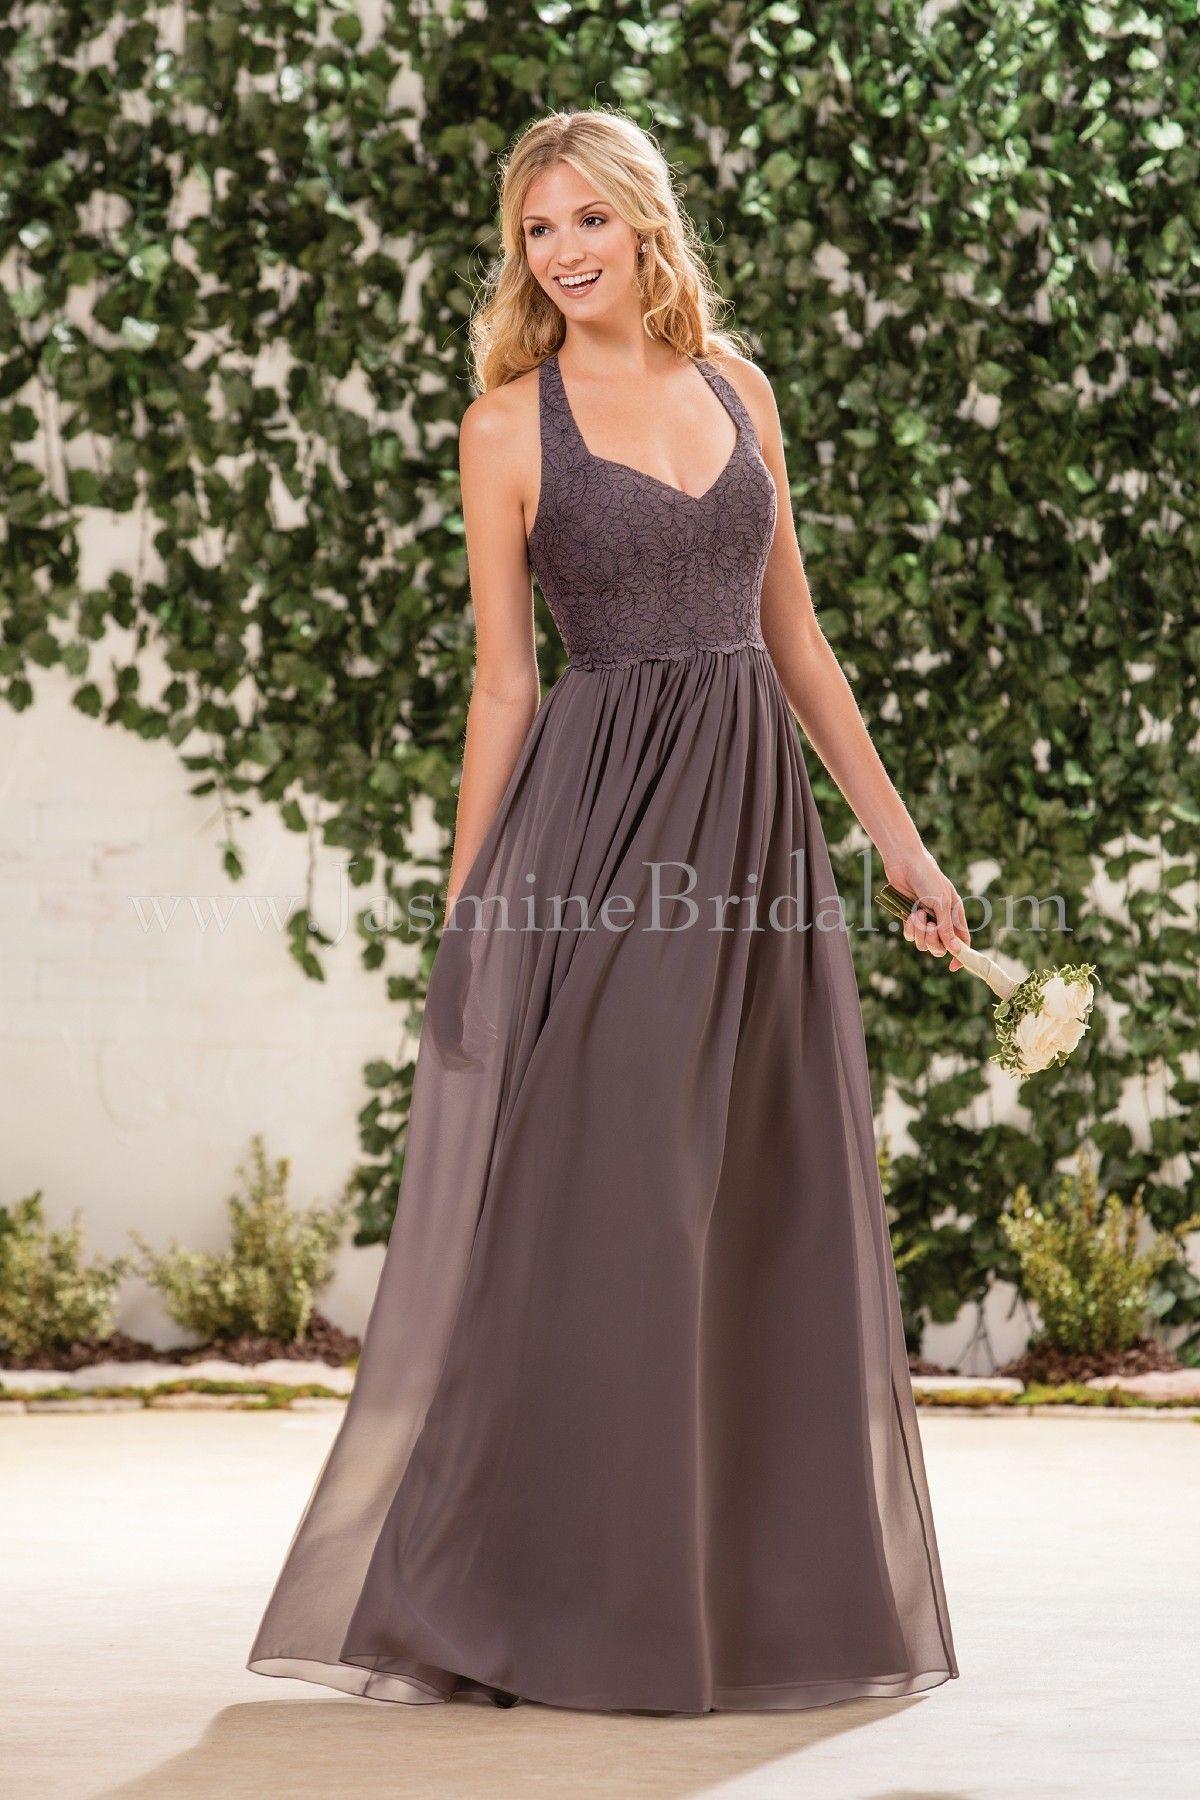 Jasmine bridal bridesmaid dress b2 style b183061 in iron fall jasmine bridal bridesmaid dress b2 style b183061 in iron ombrellifo Images